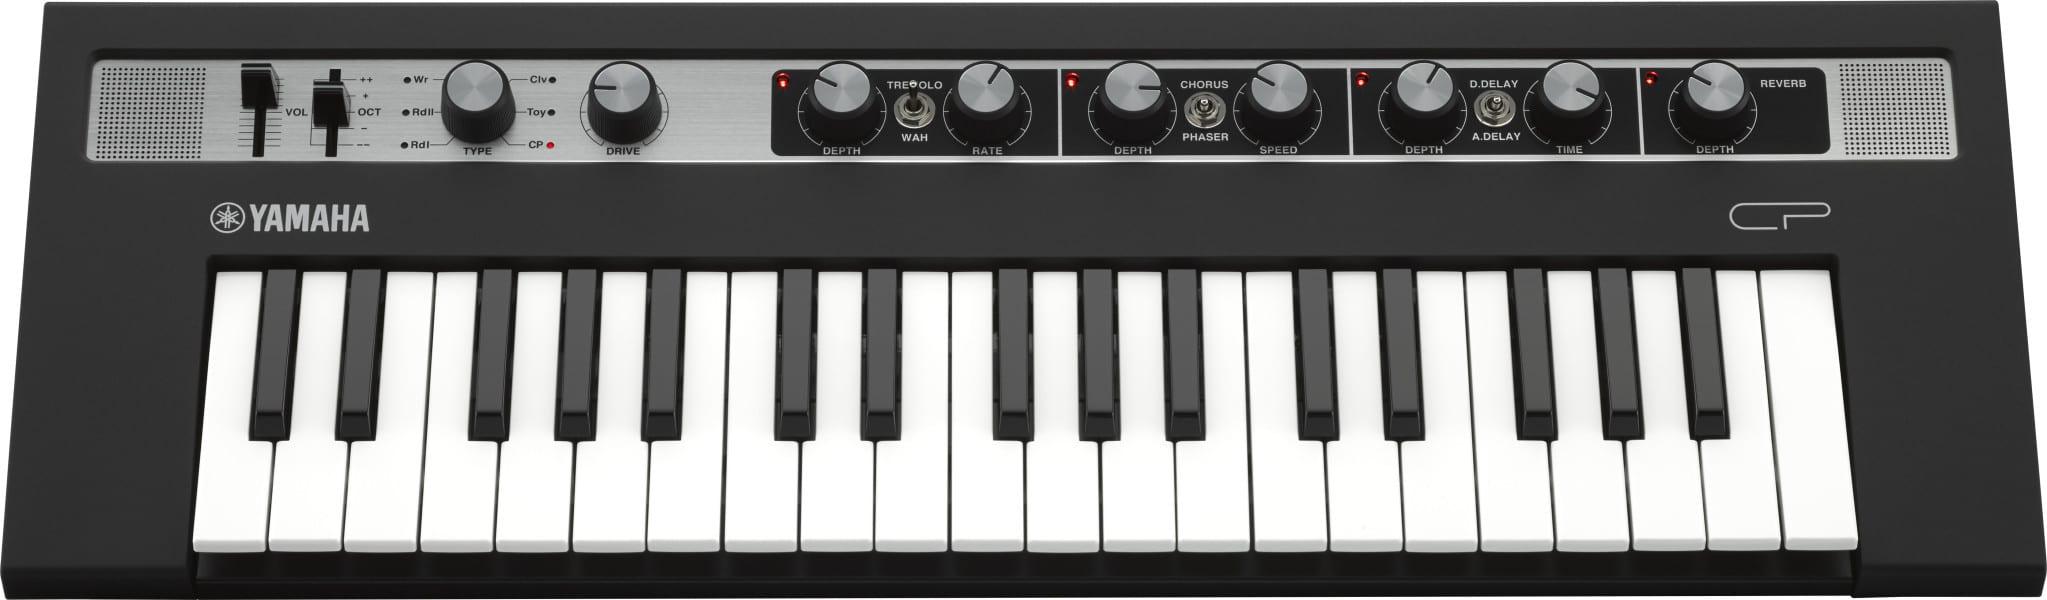 Yamaha RefaceCP Synth